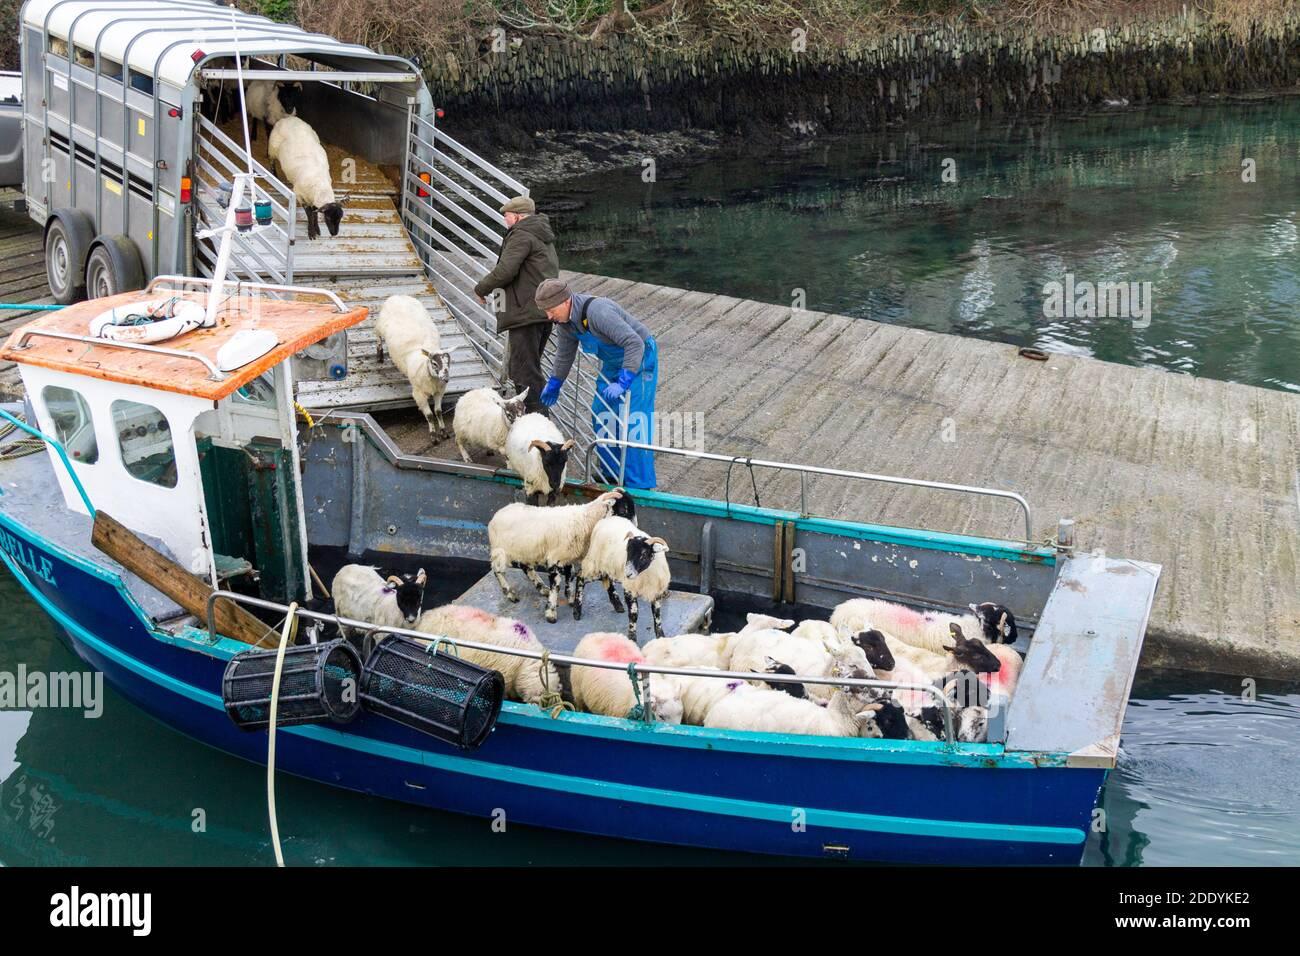 sheep-being-loaded-onto-small-fishing-boat-rural-ireland-2DDYKE2.jpg